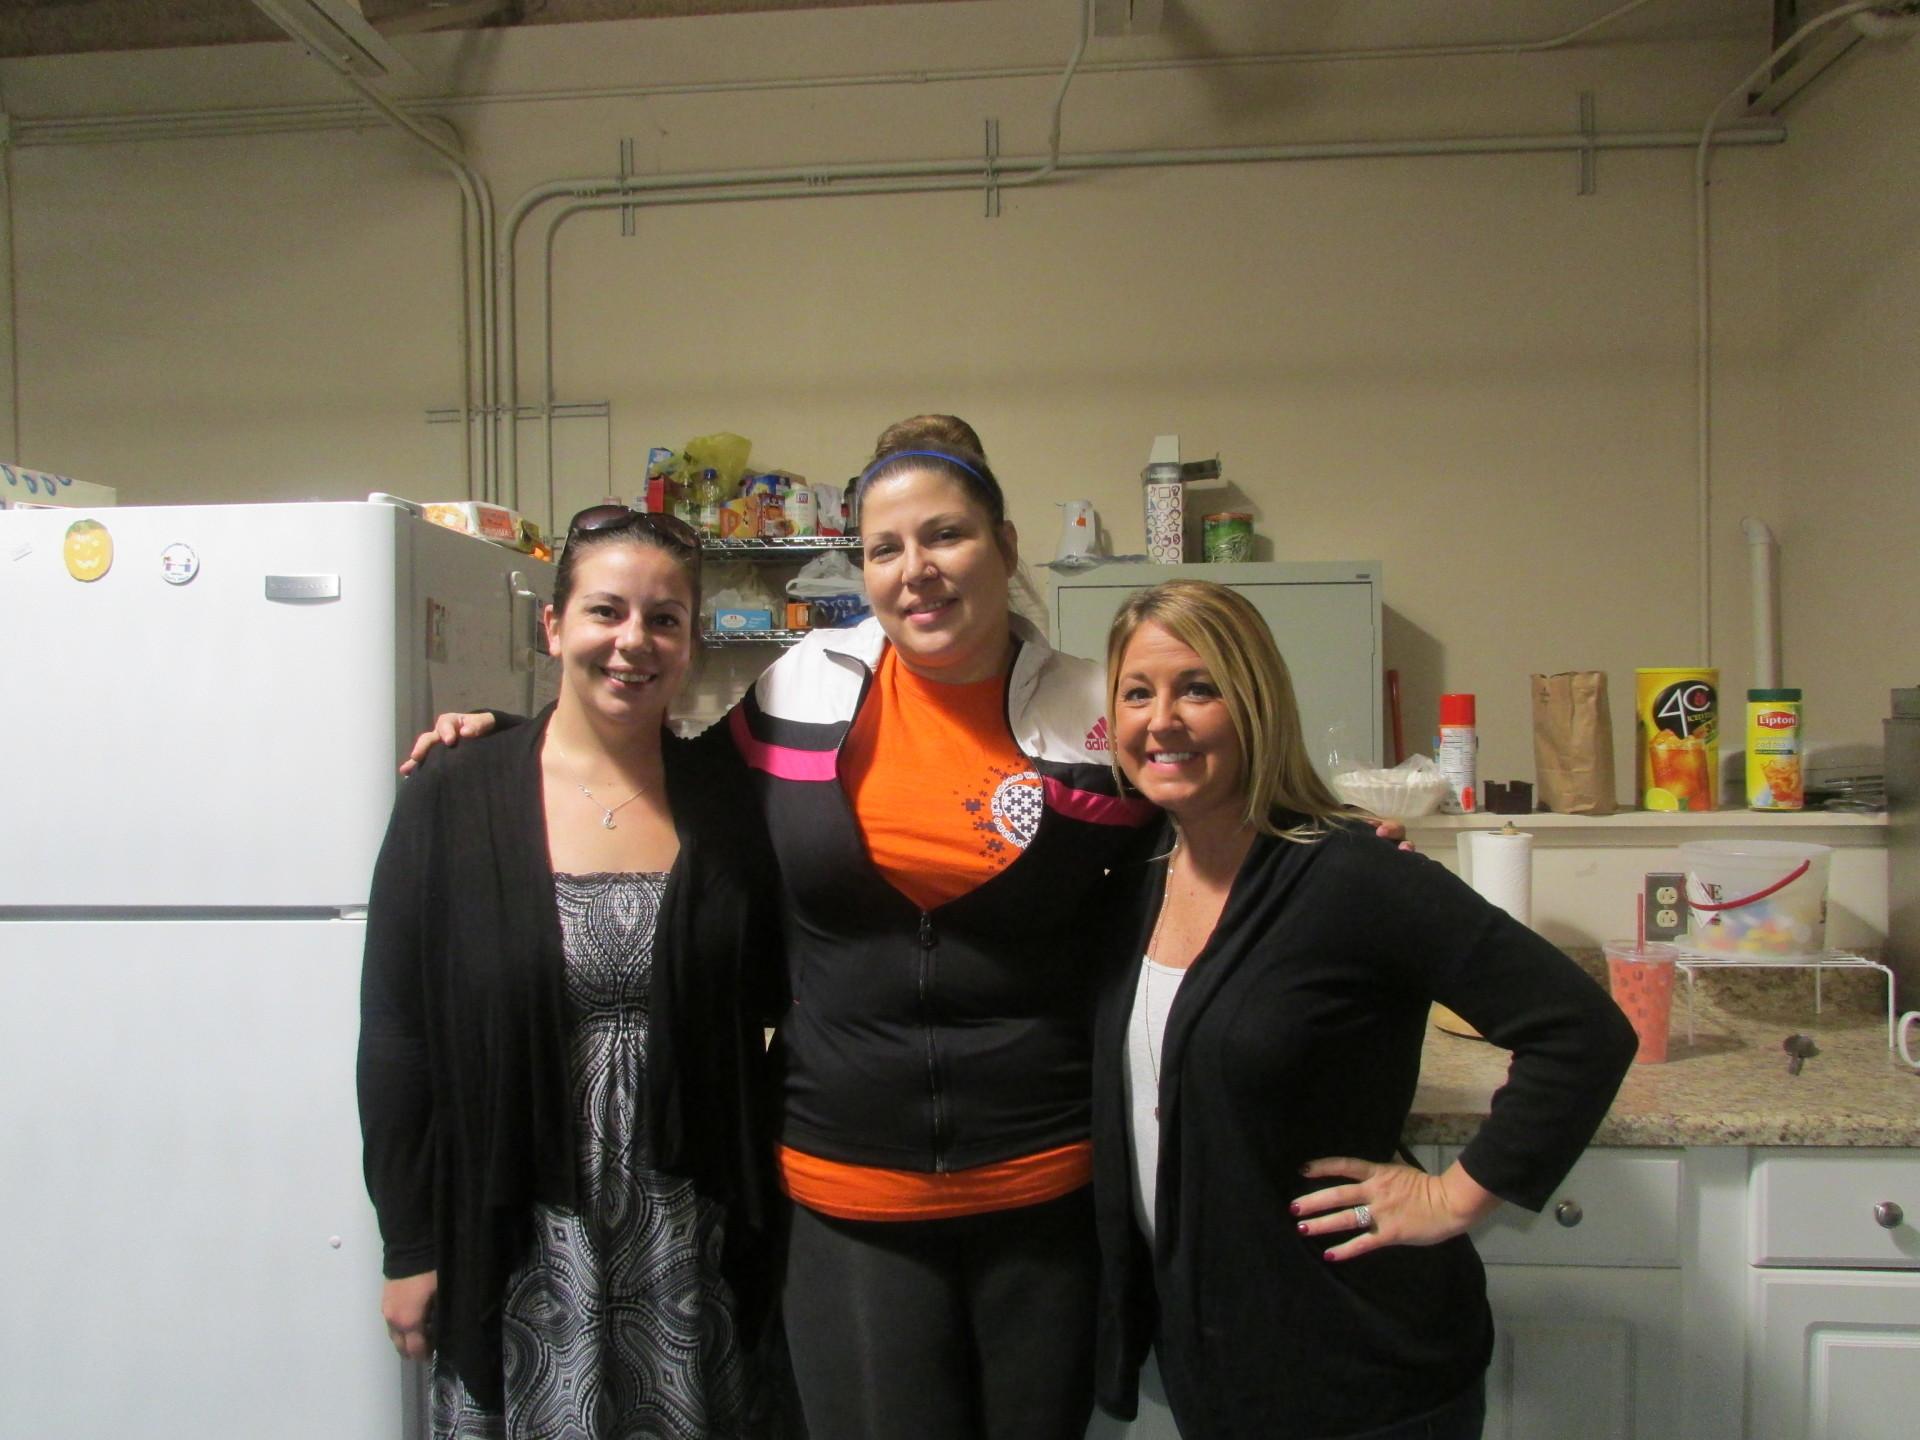 Kayla, April, & Melissa